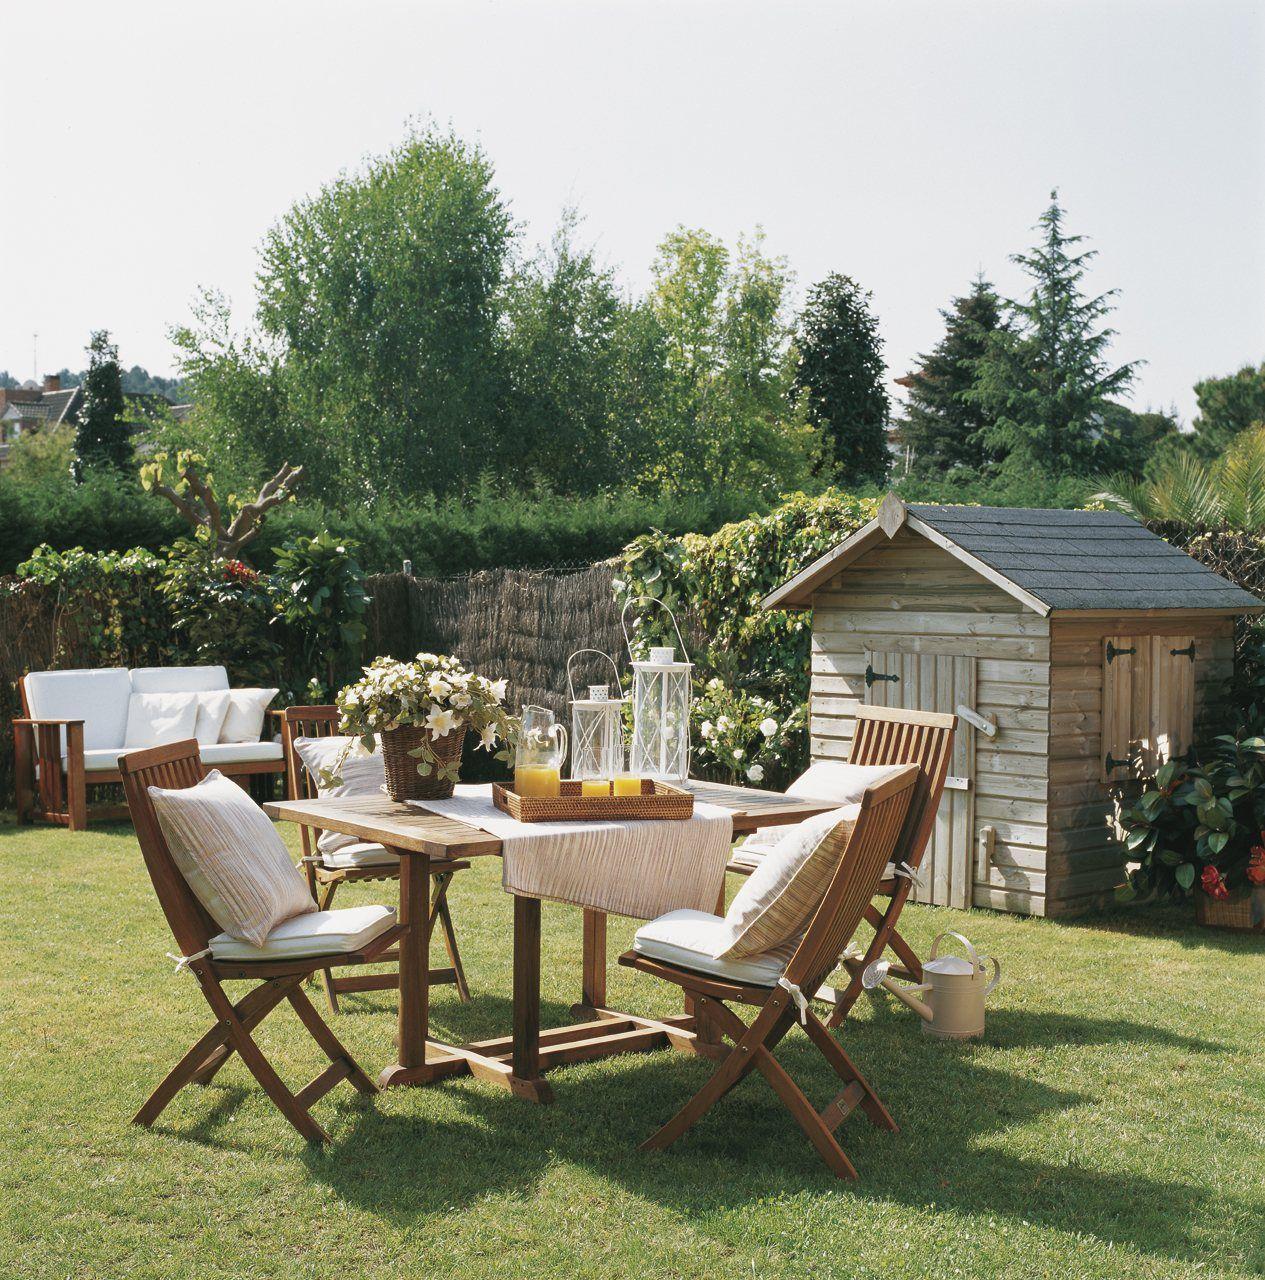 11 comedores de verano madera pinterest comedores - Sillas plegables jardin ...